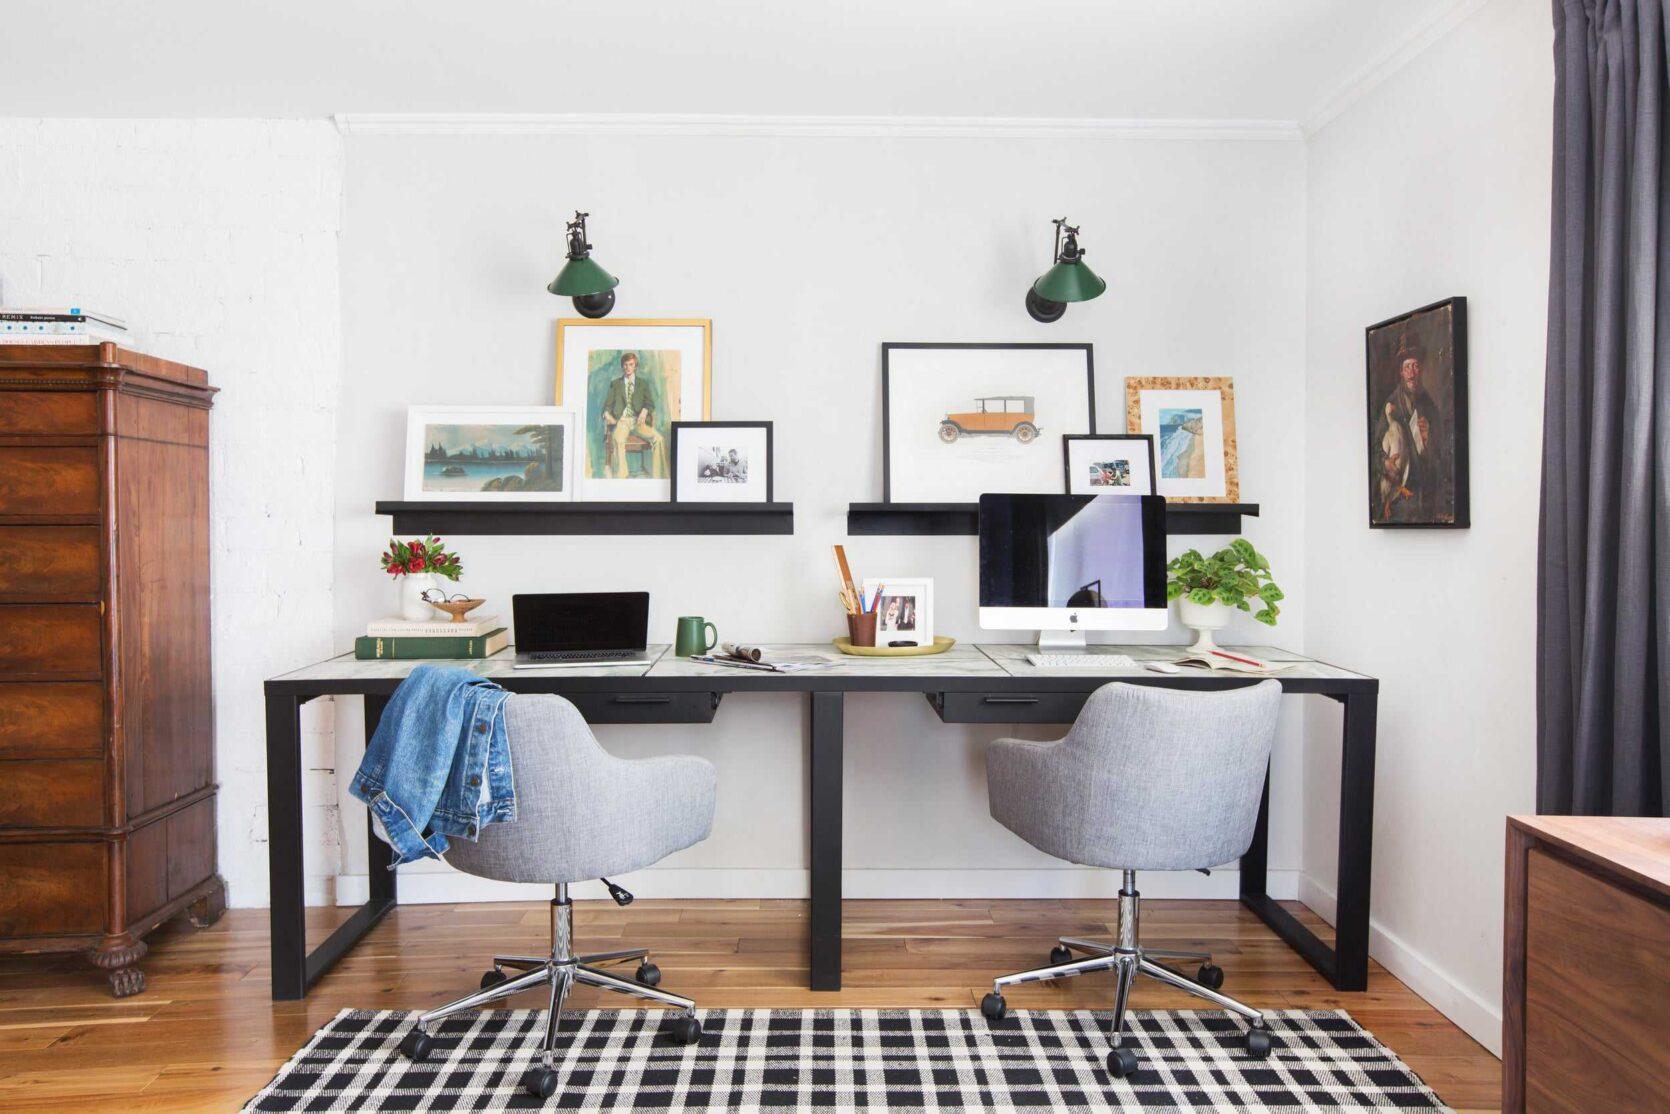 Emily Henderson Framebridge Art Ledge Brians Office Masculine Office Guy Green Plaid Rug Workspace Modern Eclectic 1